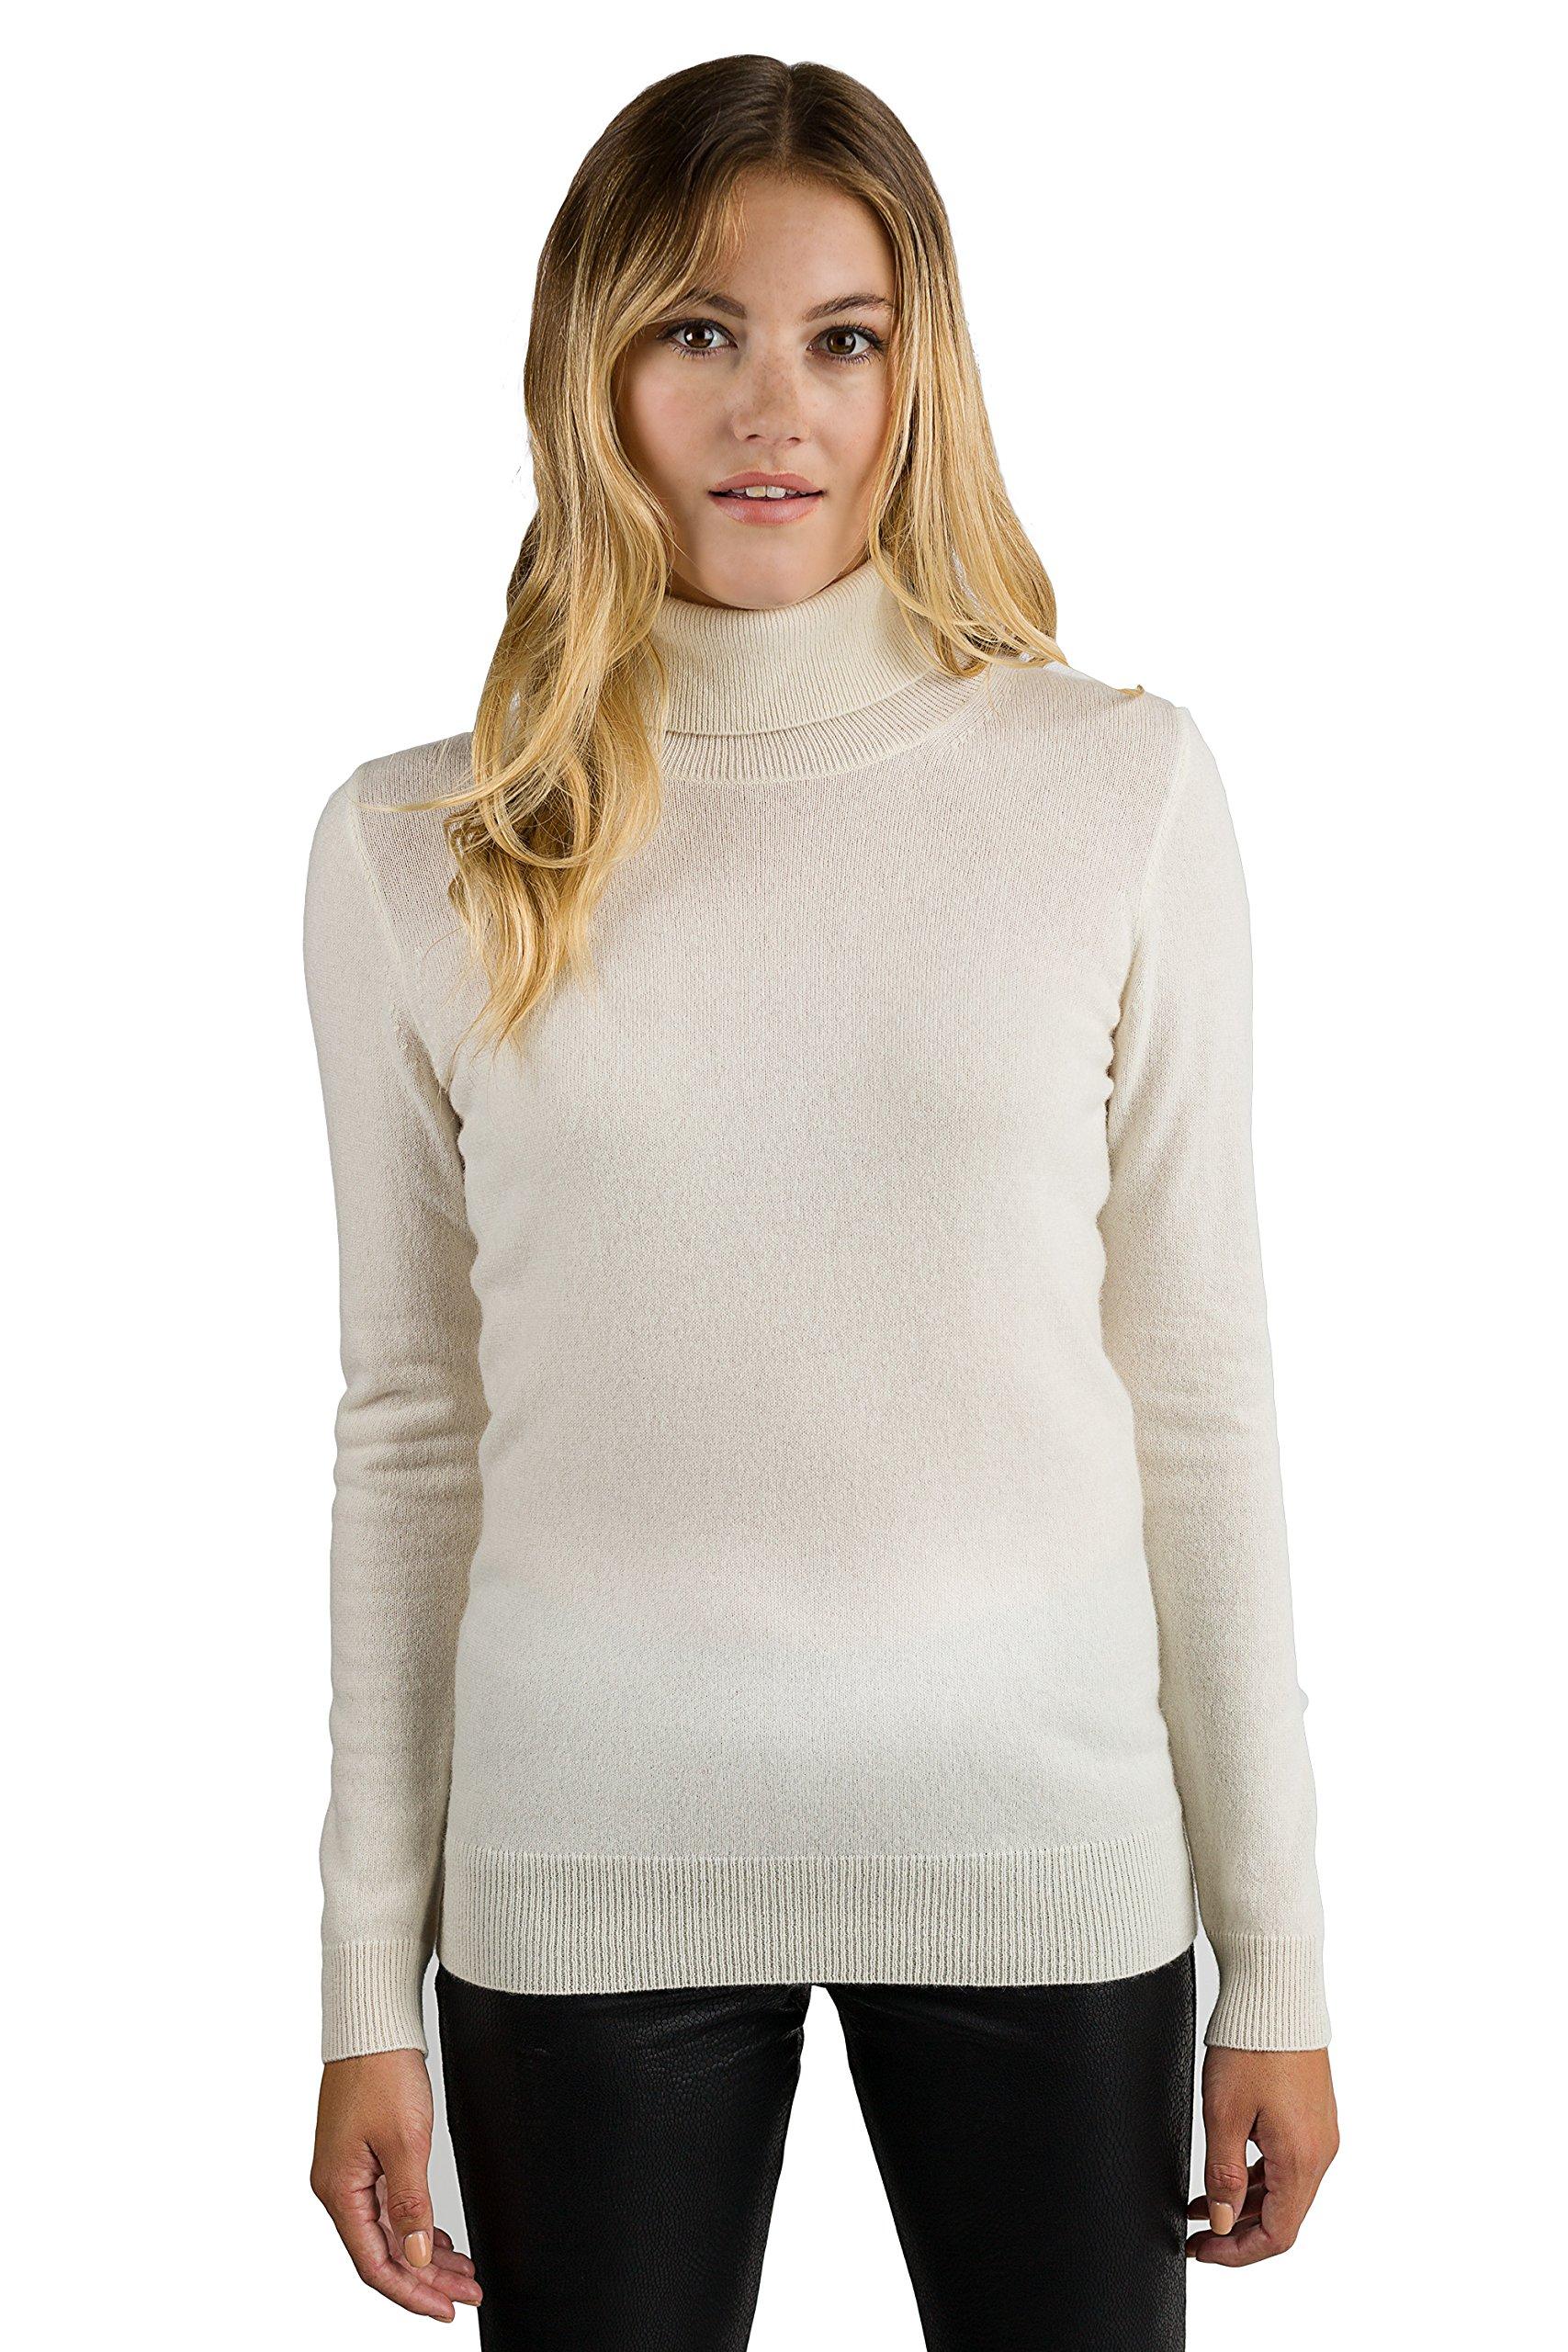 JENNIE LIU Women's 100% Pure Cashmere Long Sleeve Pullover Turtleneck Sweater (M, Cream)